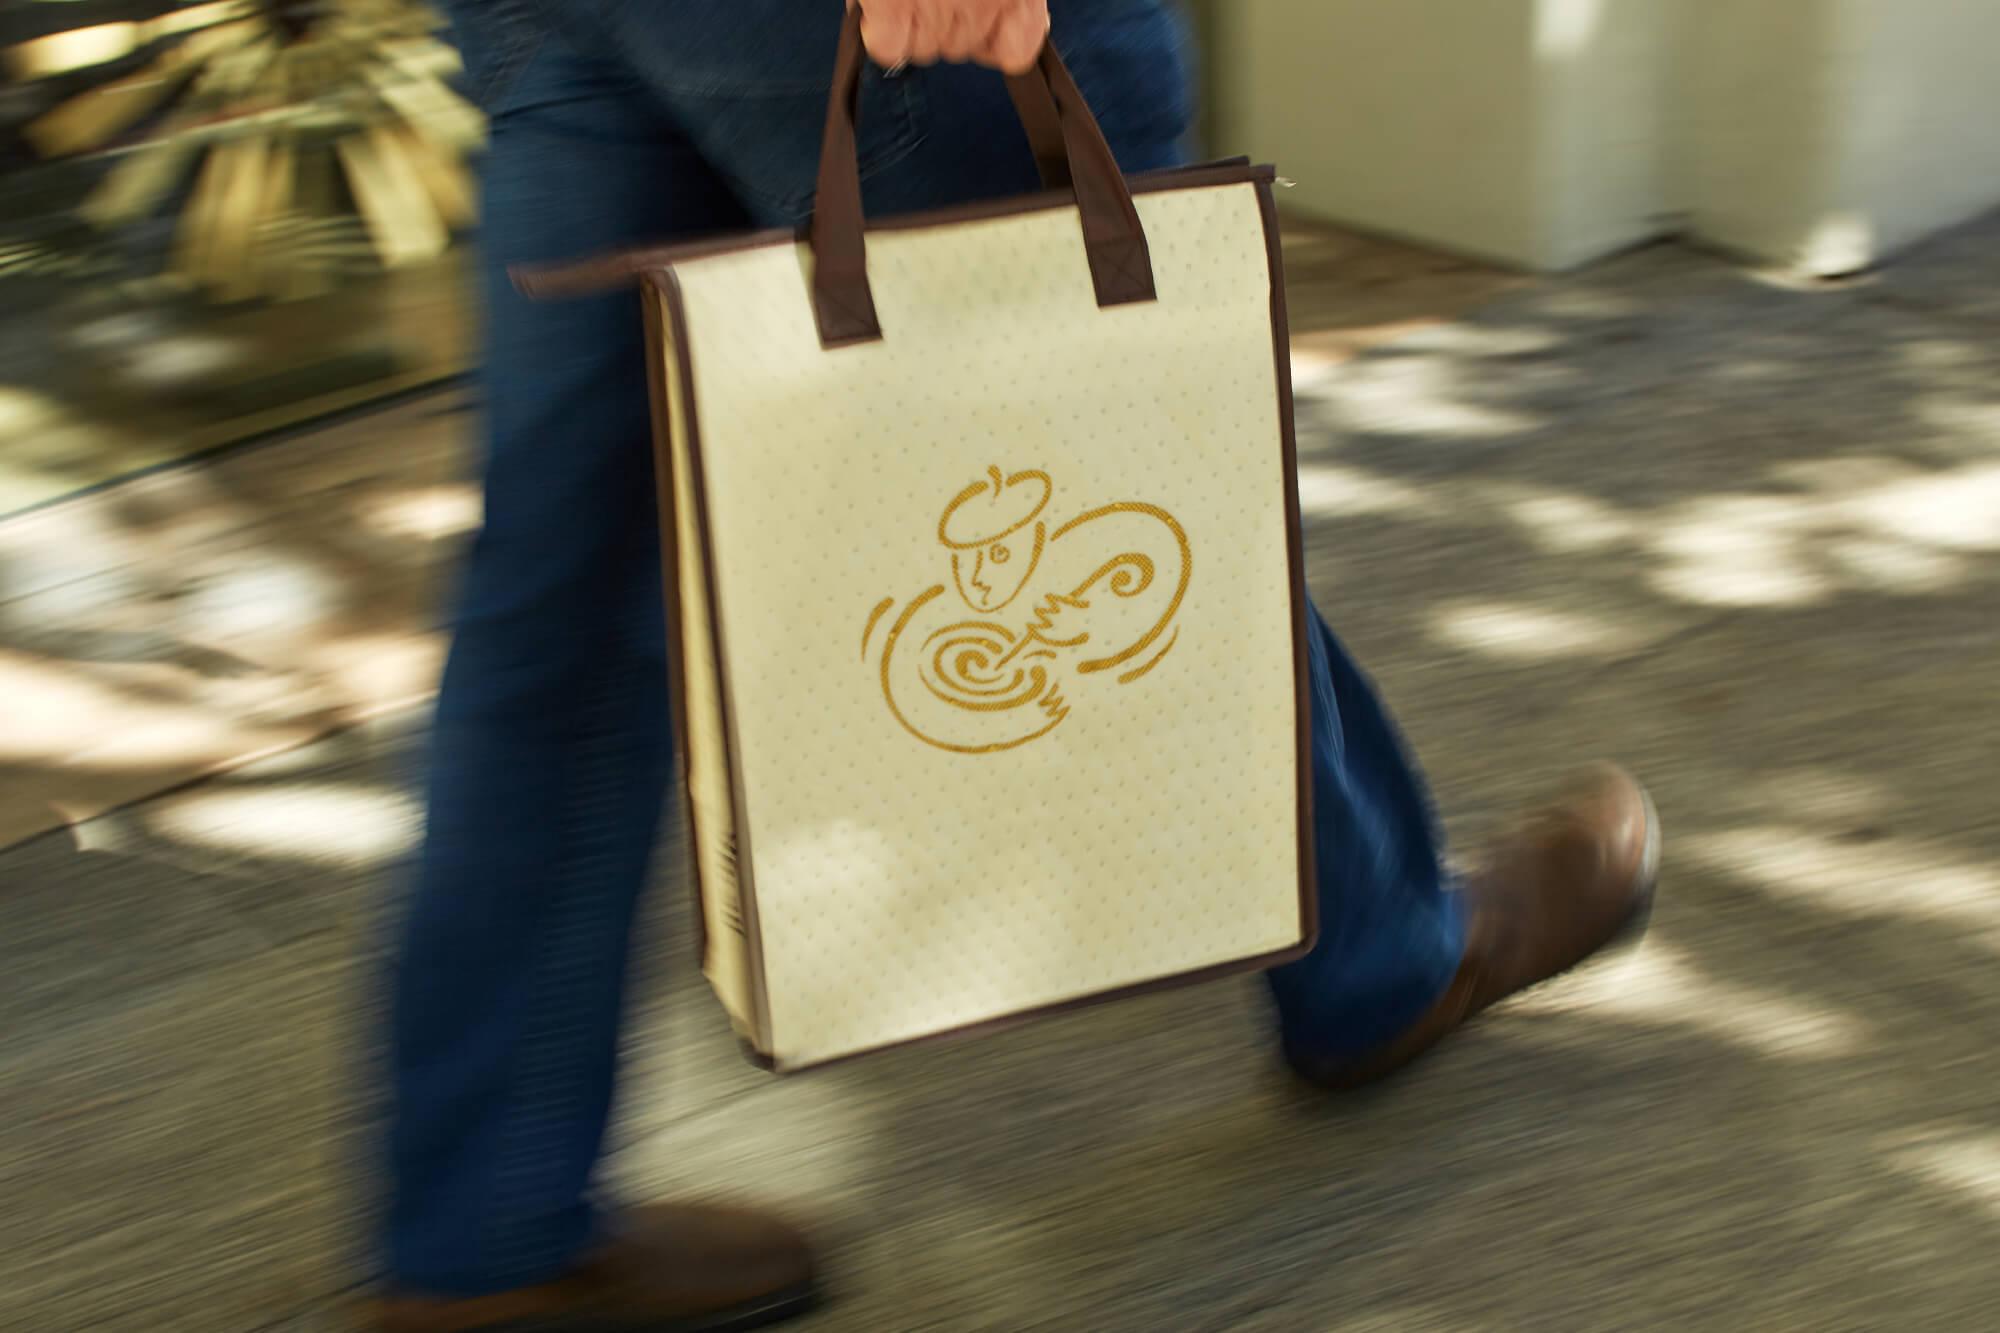 margaret_river_chocolate_company_shopping_bag